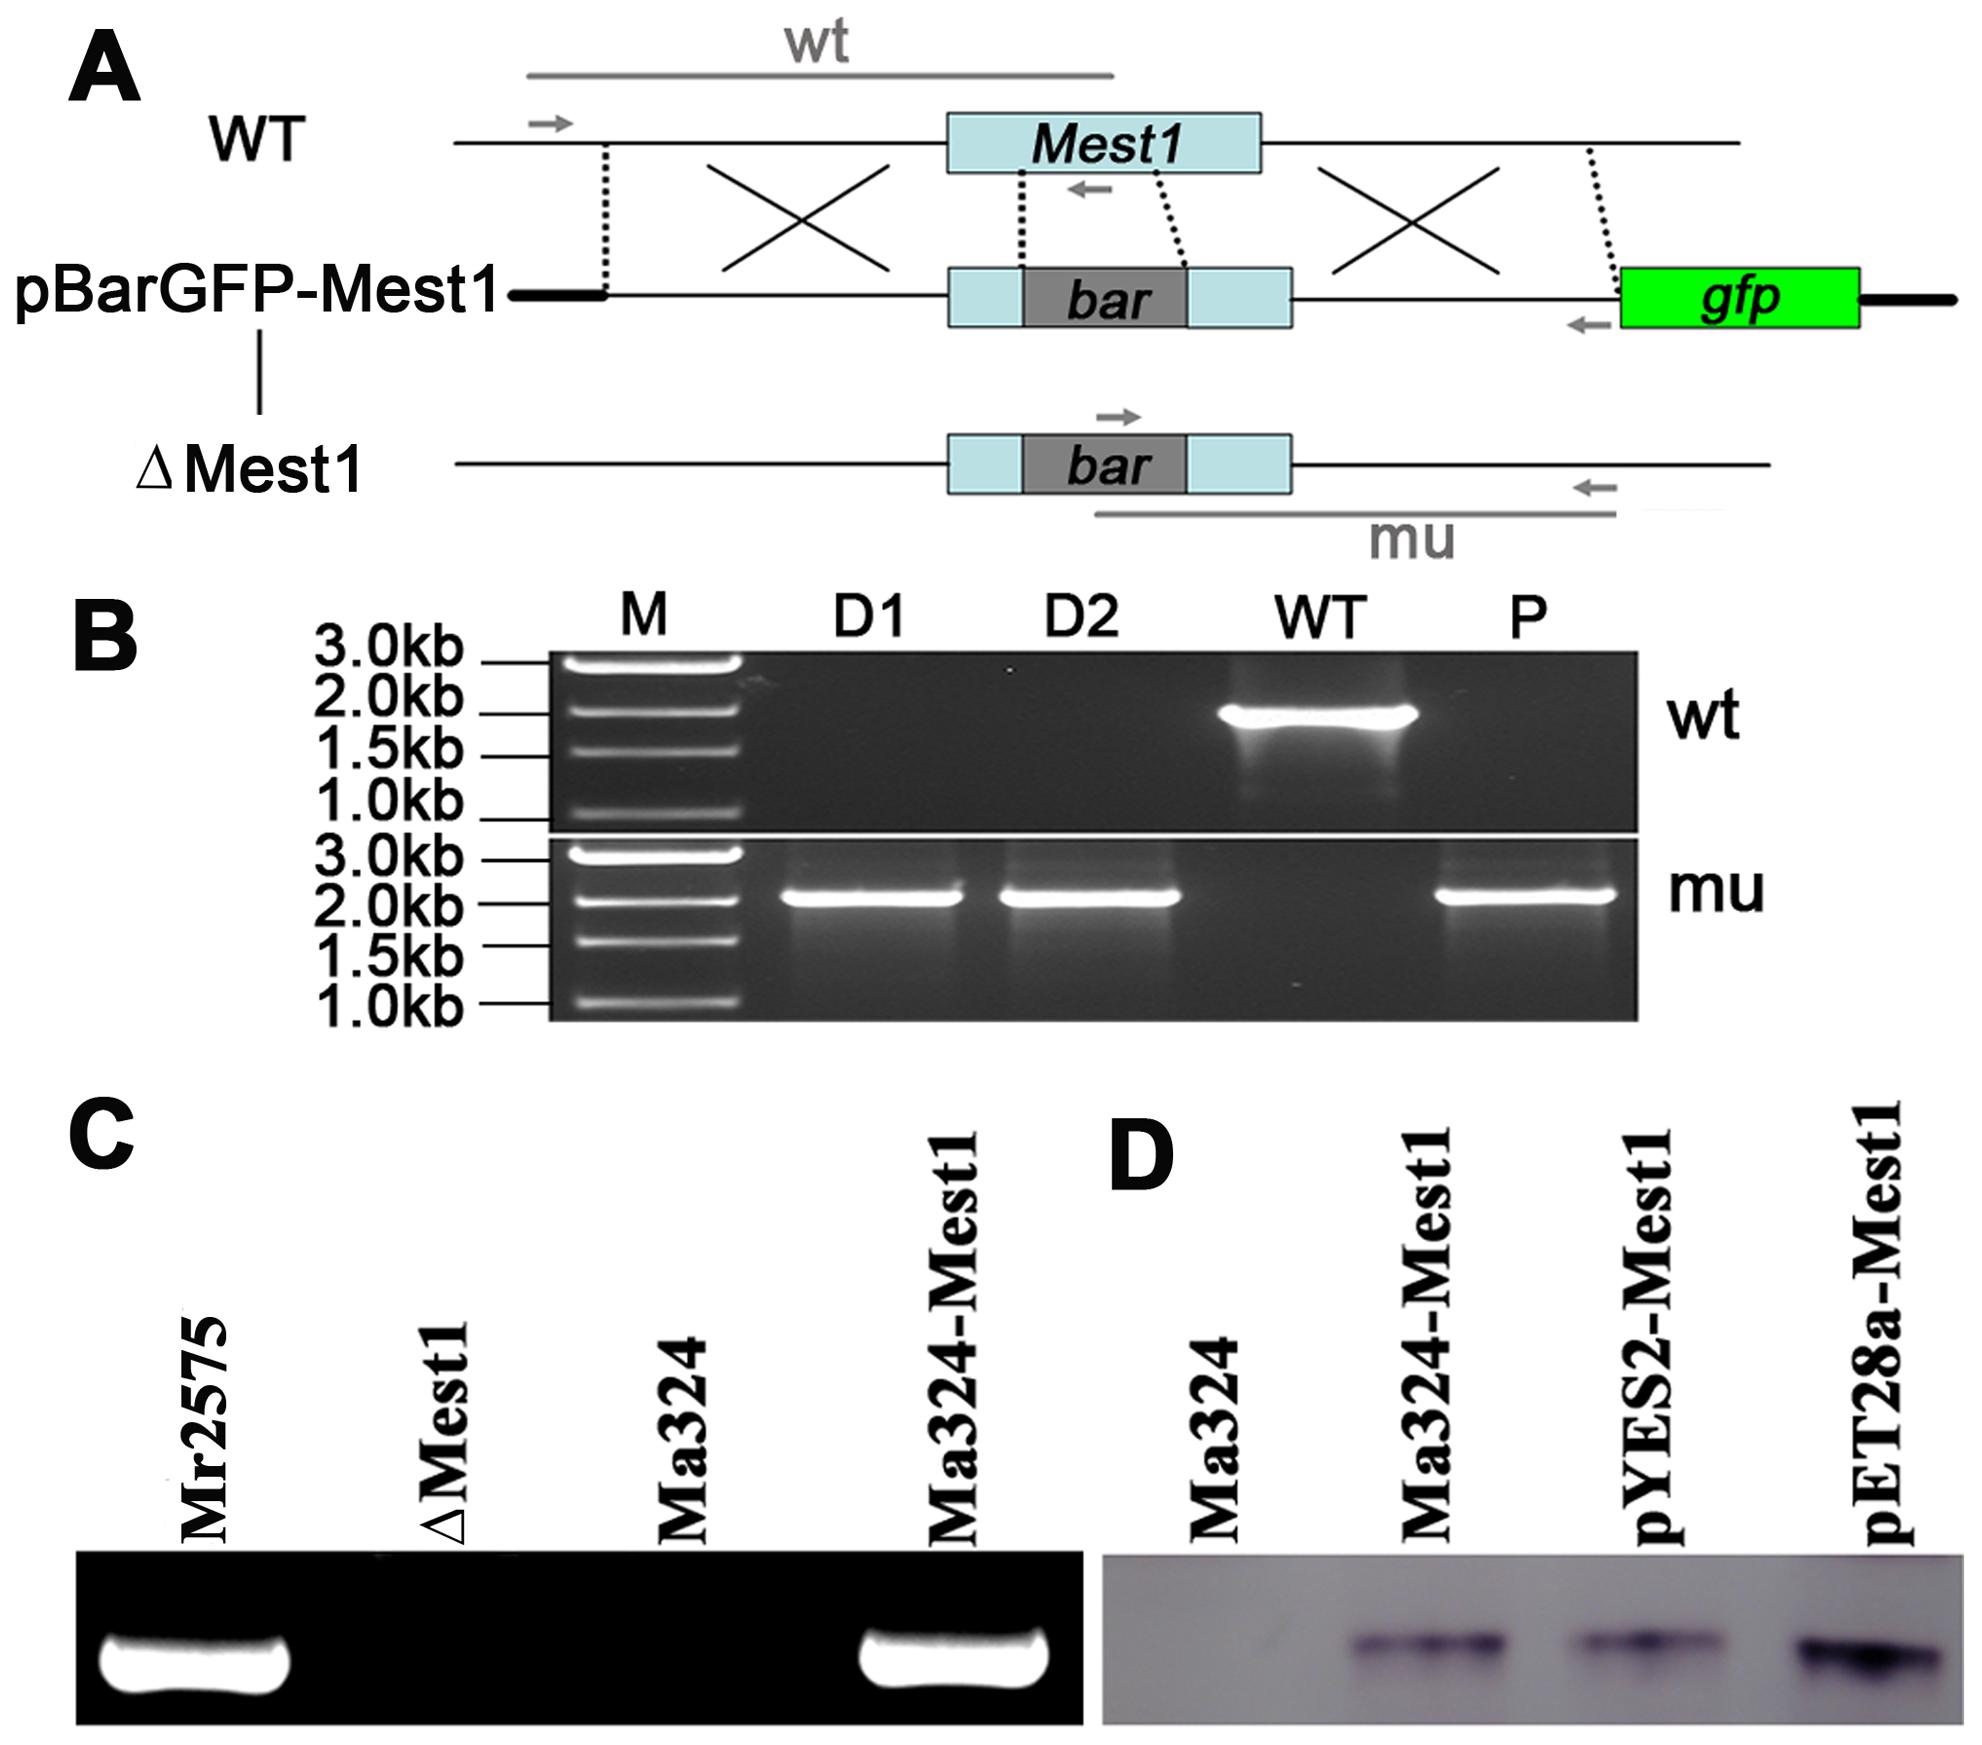 Disruption of the <i>Mest1</i> gene in <i>Metarhizium robertsii</i> Mr2575.